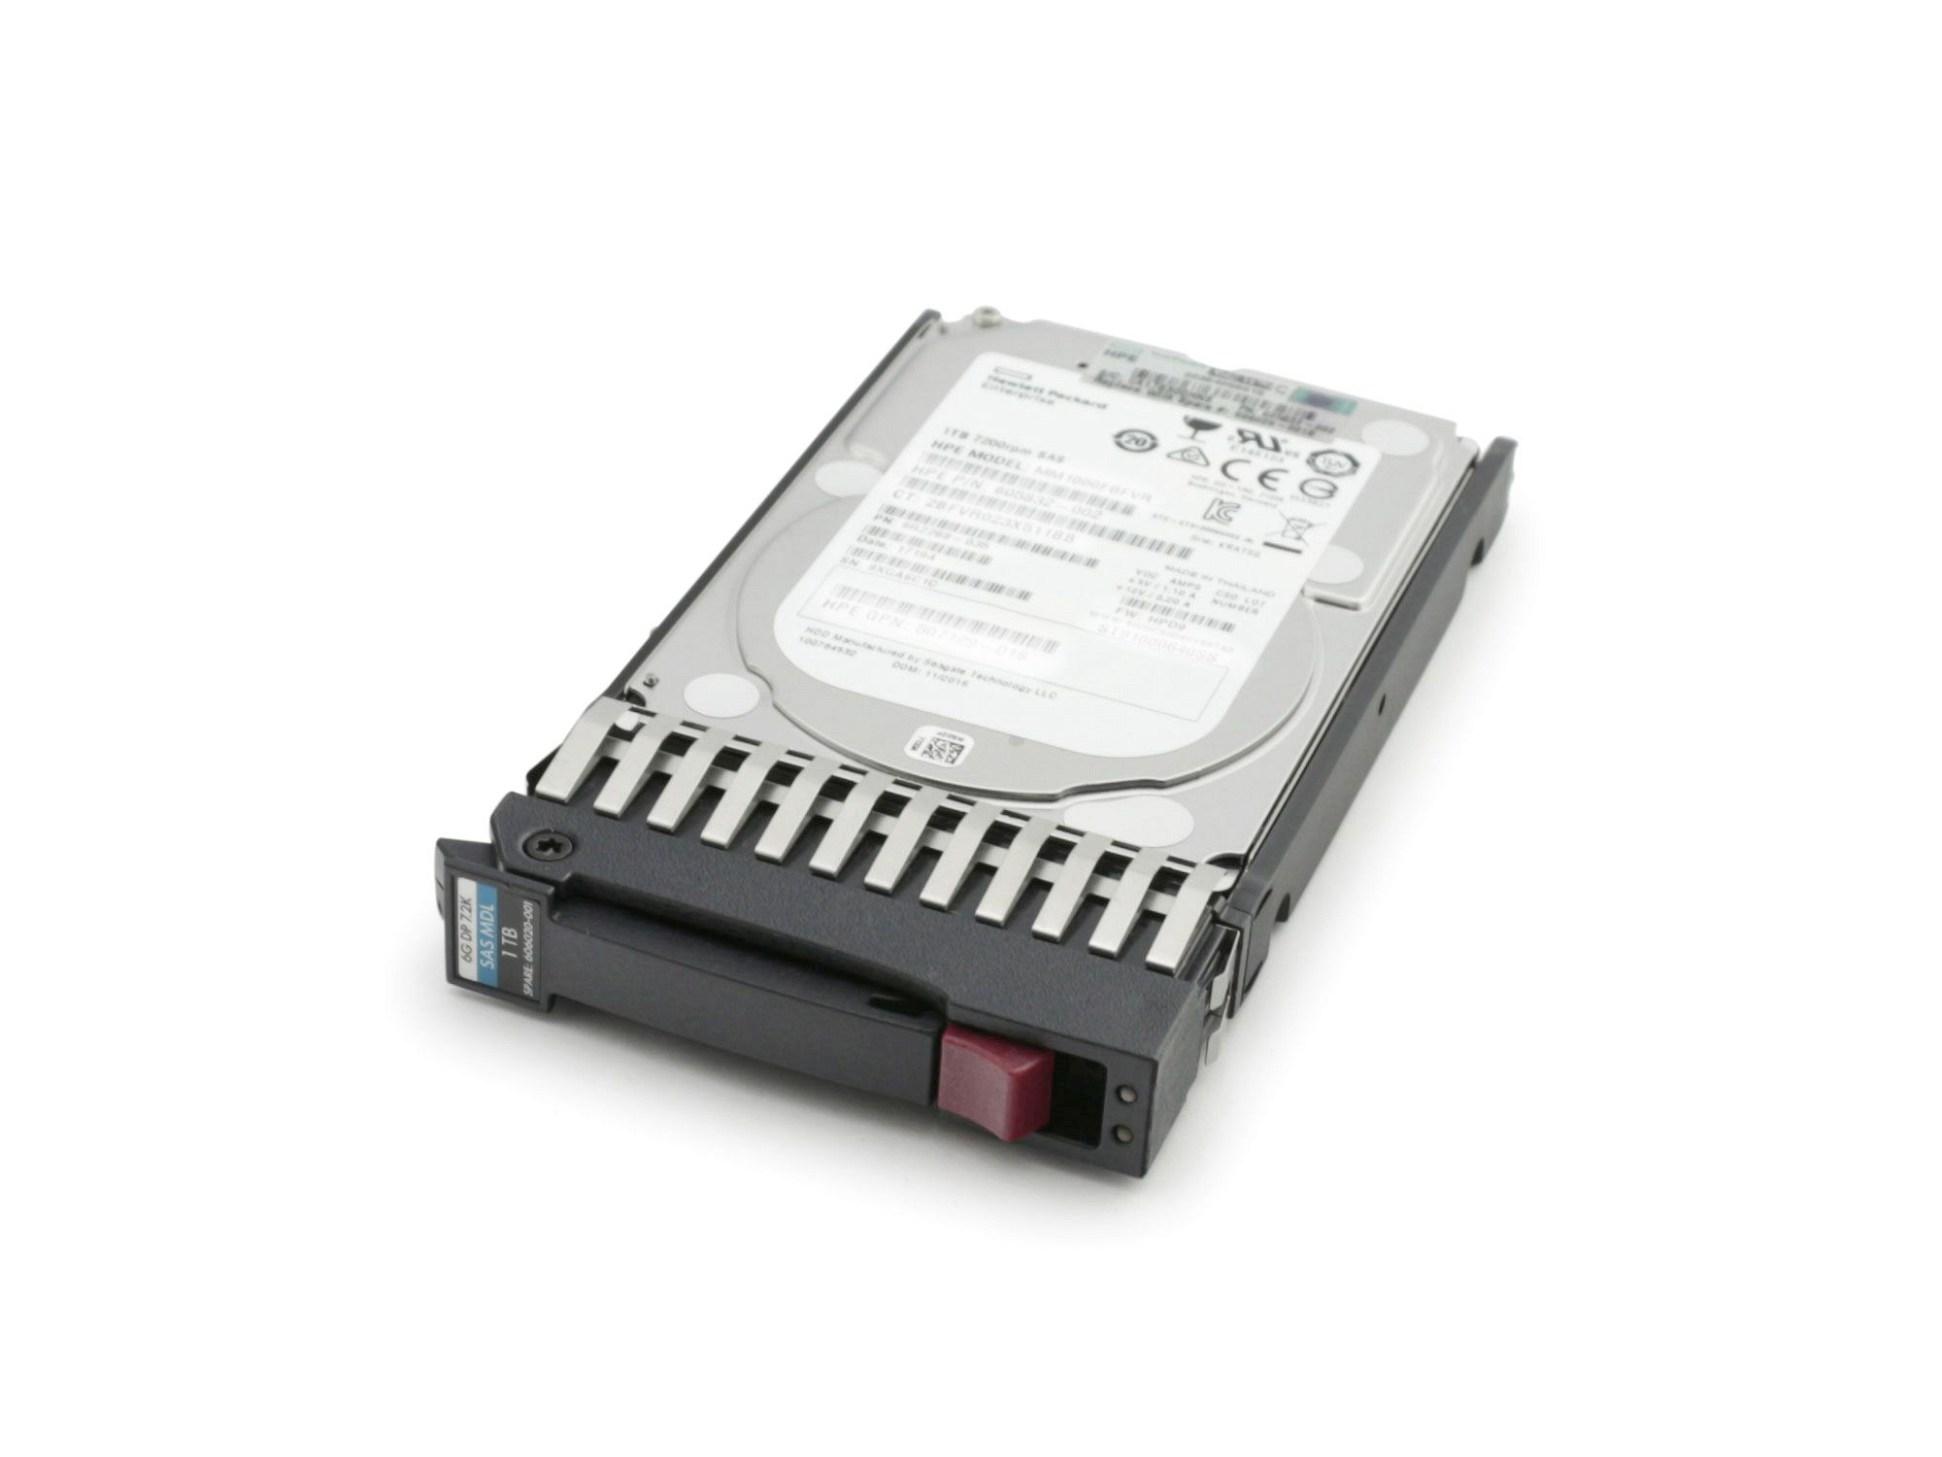 Server Festplatte HDD 1TB (2,5 Zoll / 6,4 cm) SAS II (6 Gb/s) DP SPS 7.2K inkl. Hot-Plug für Hewlett Packard ProLiant BL465c G7